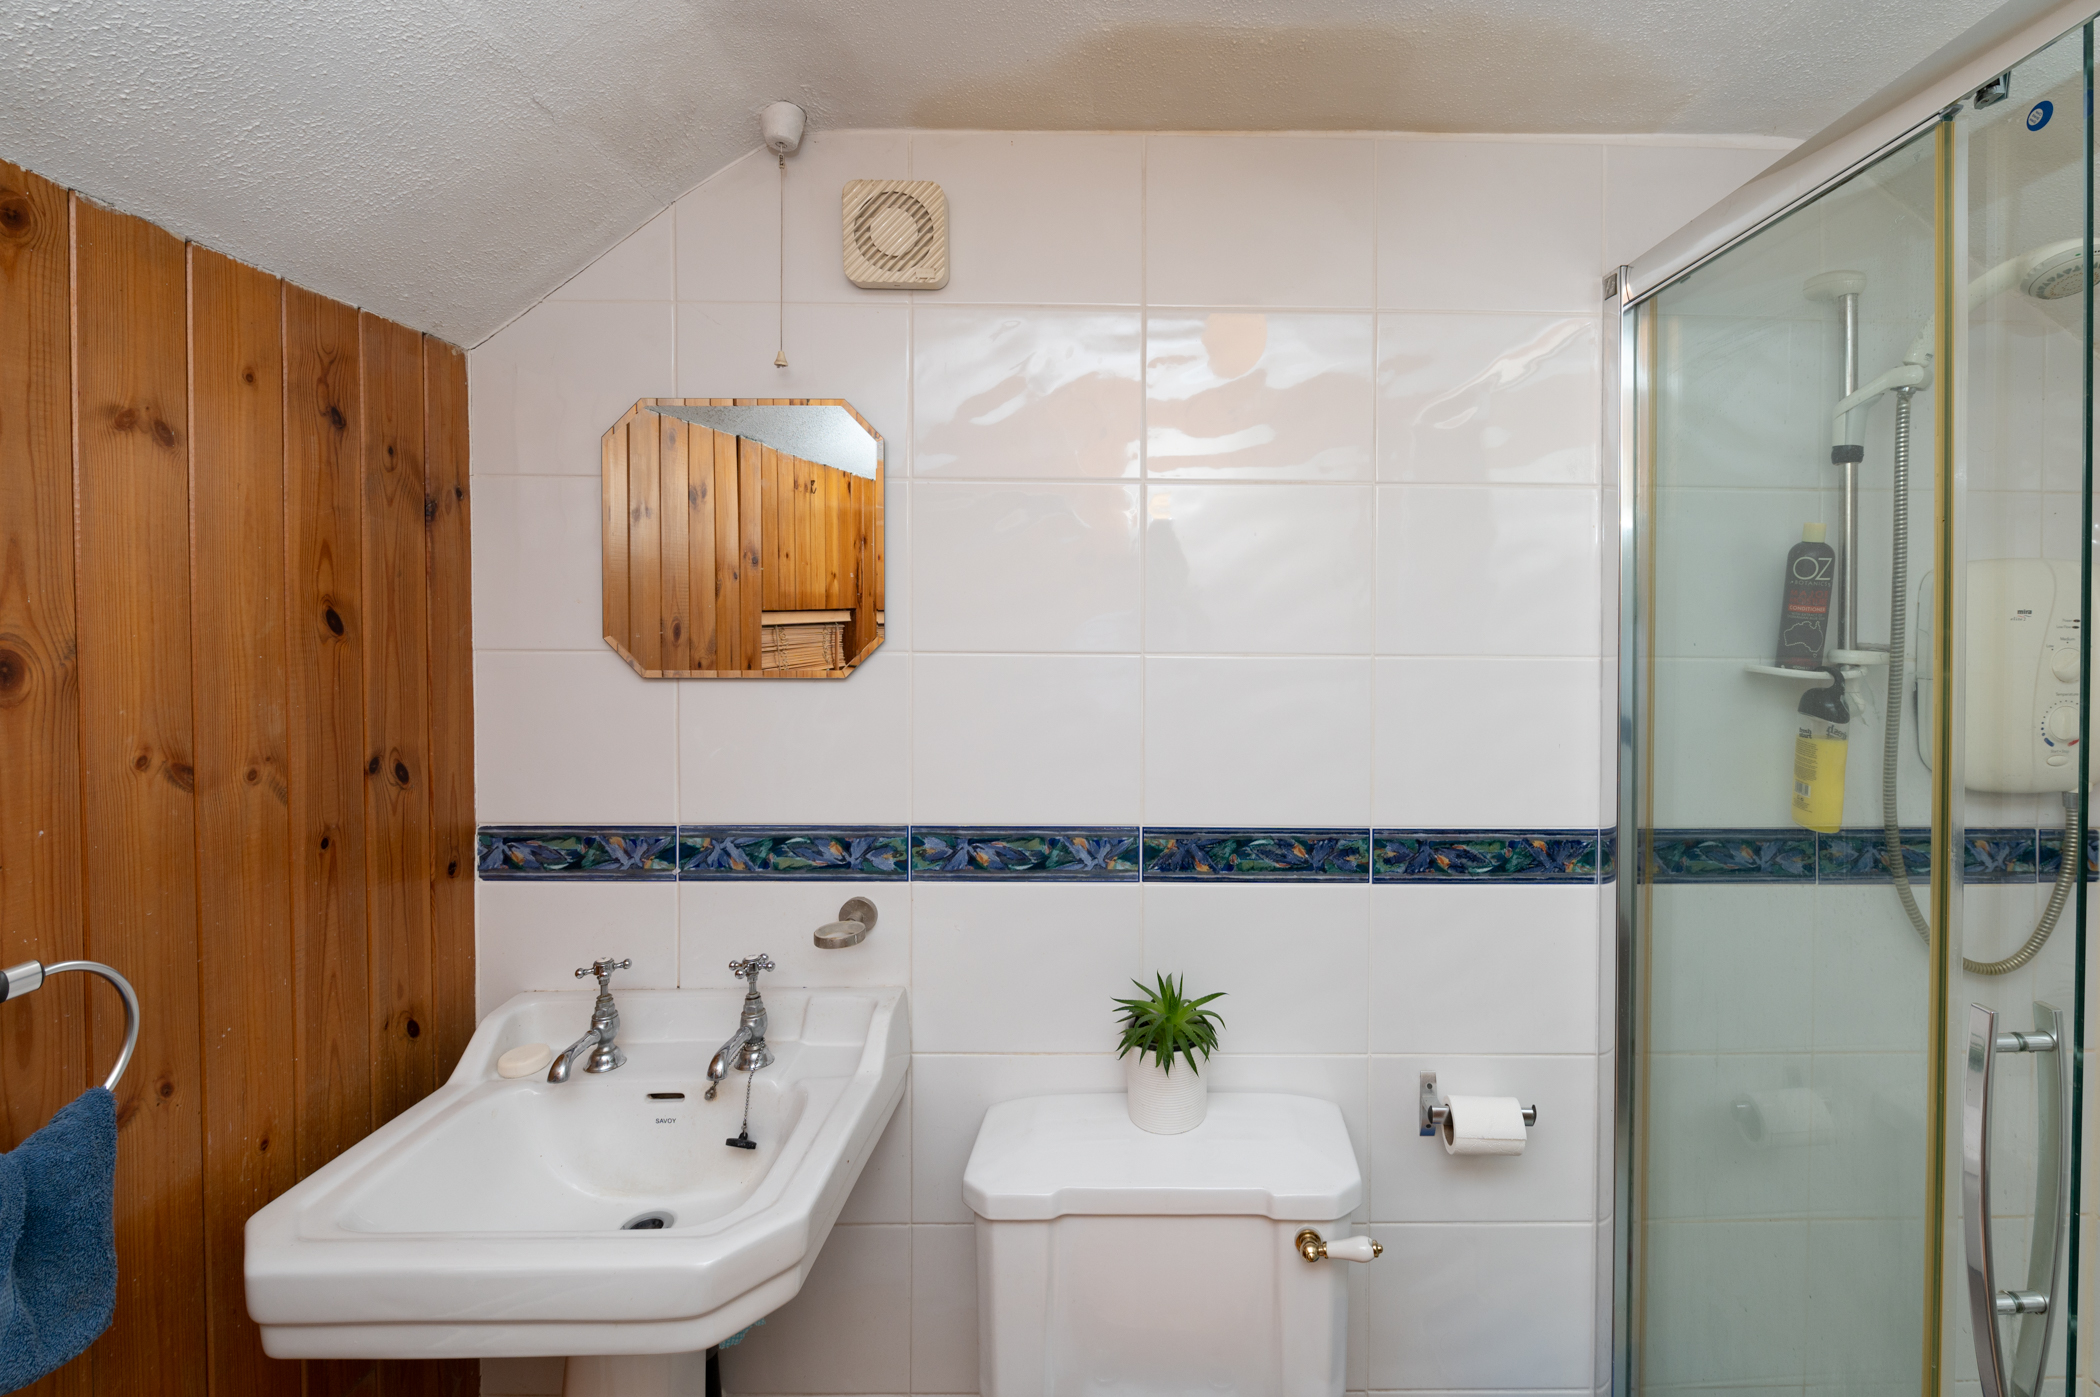 https://kms-keanemahonysmith.s3.amazonaws.com/media/137__main_bathroom.jpg